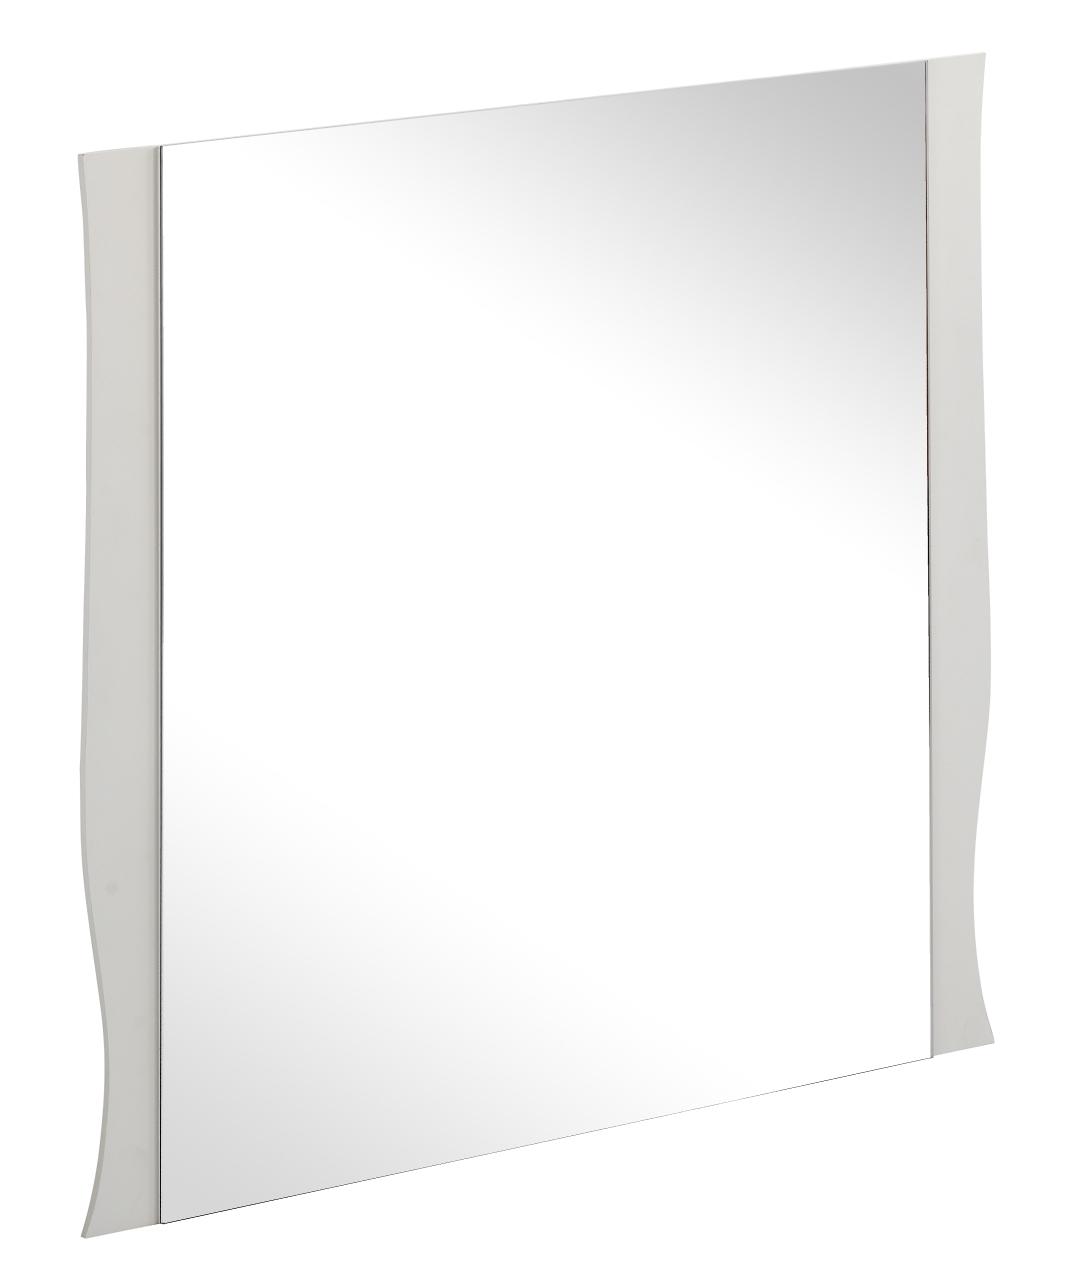 Oglinda pentru baie L80xl60 cm Elisabeth